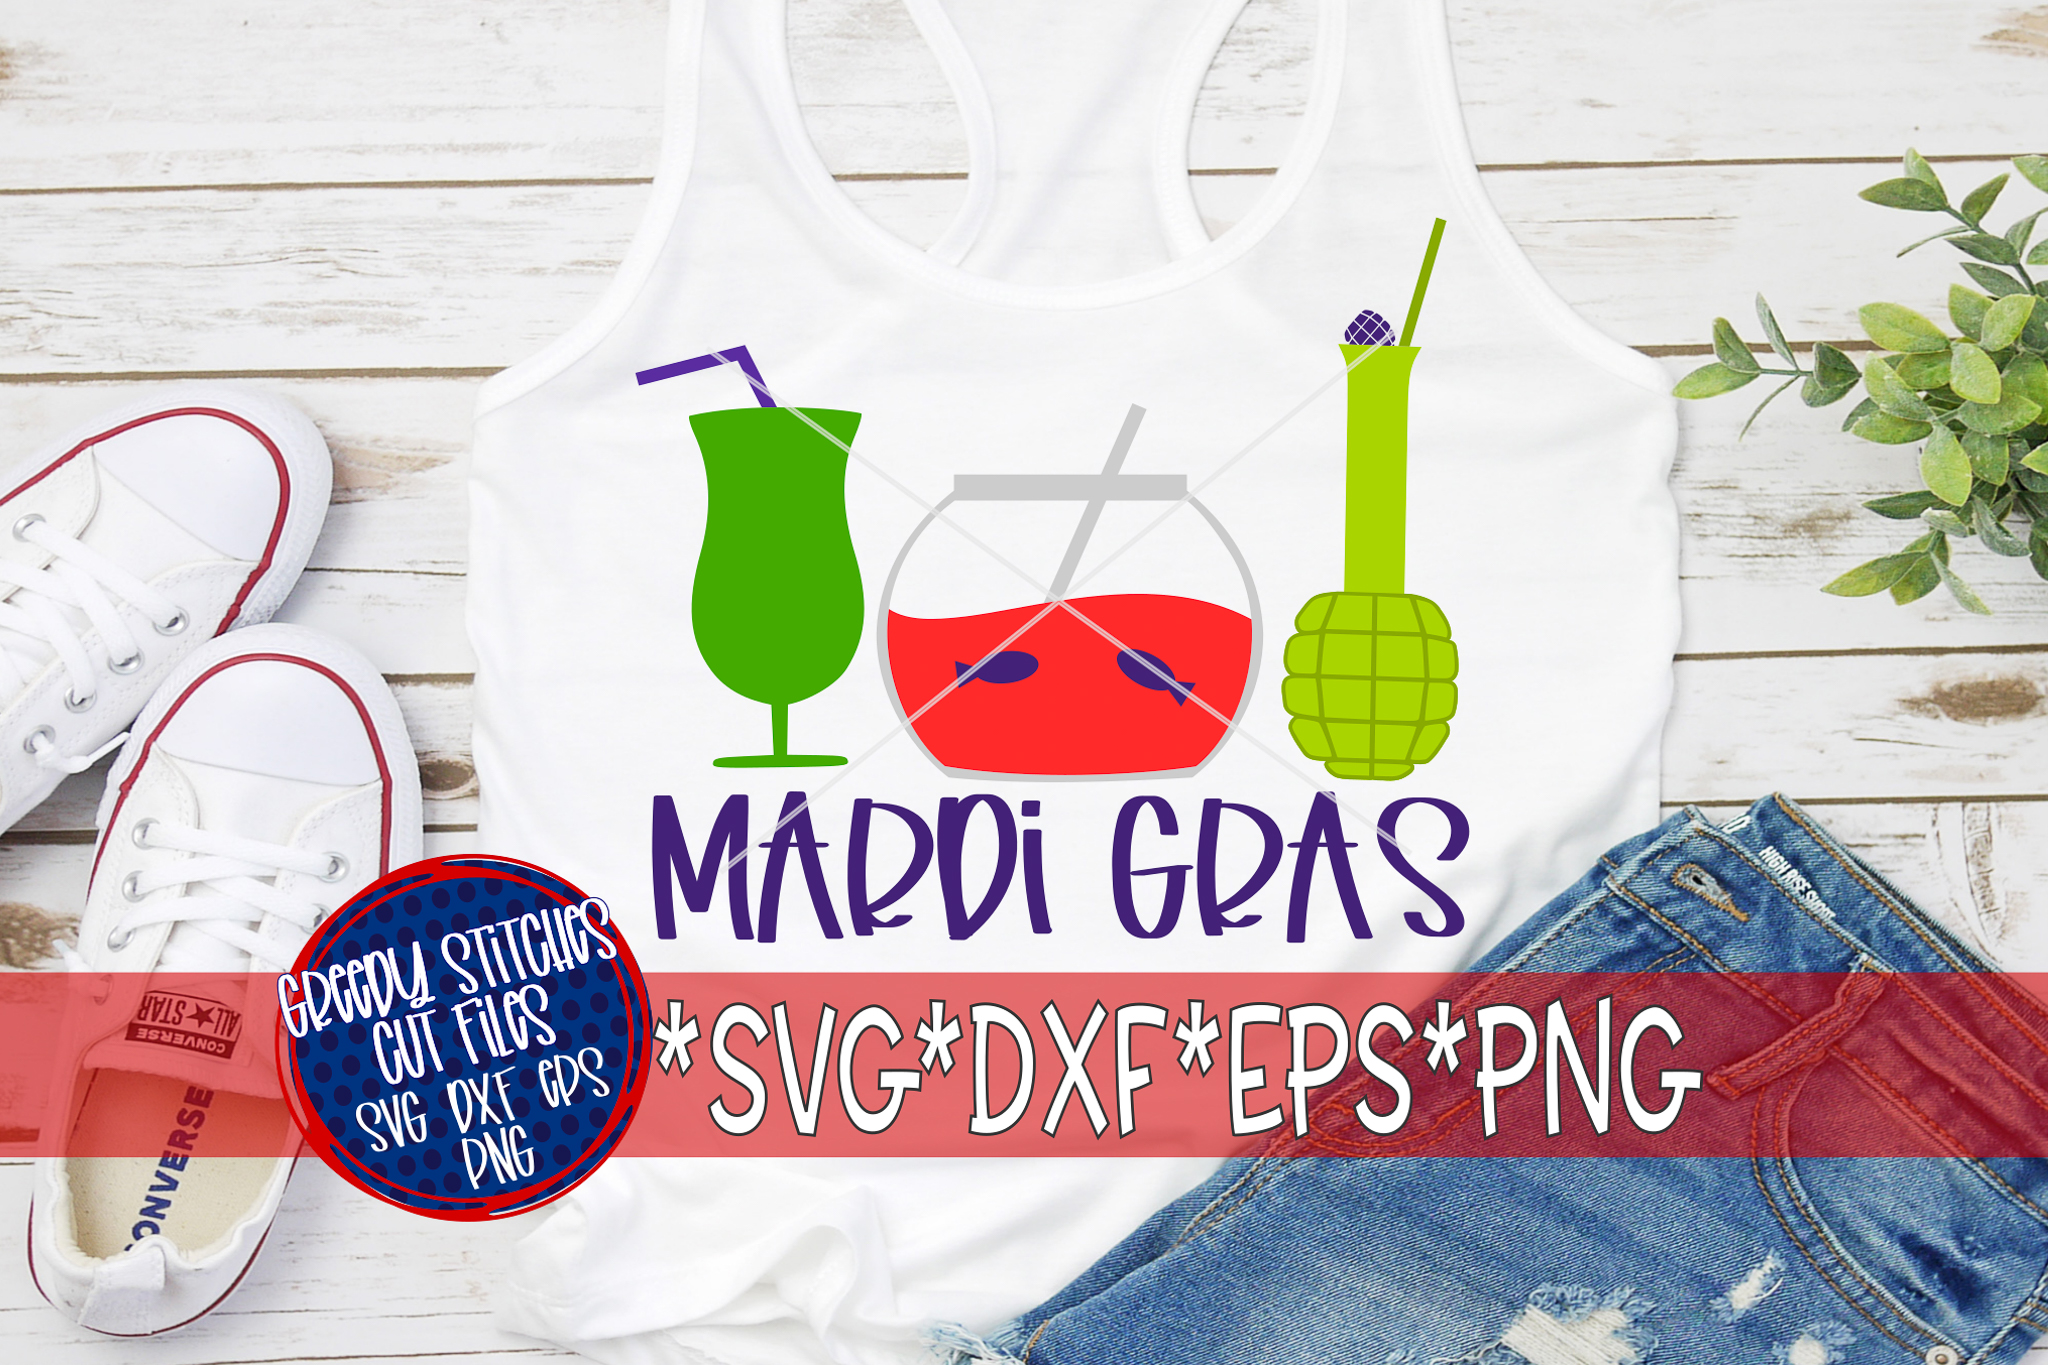 Mardi Gras |Mardi Gras Drinks SVG DXF EPS PNG example image 3